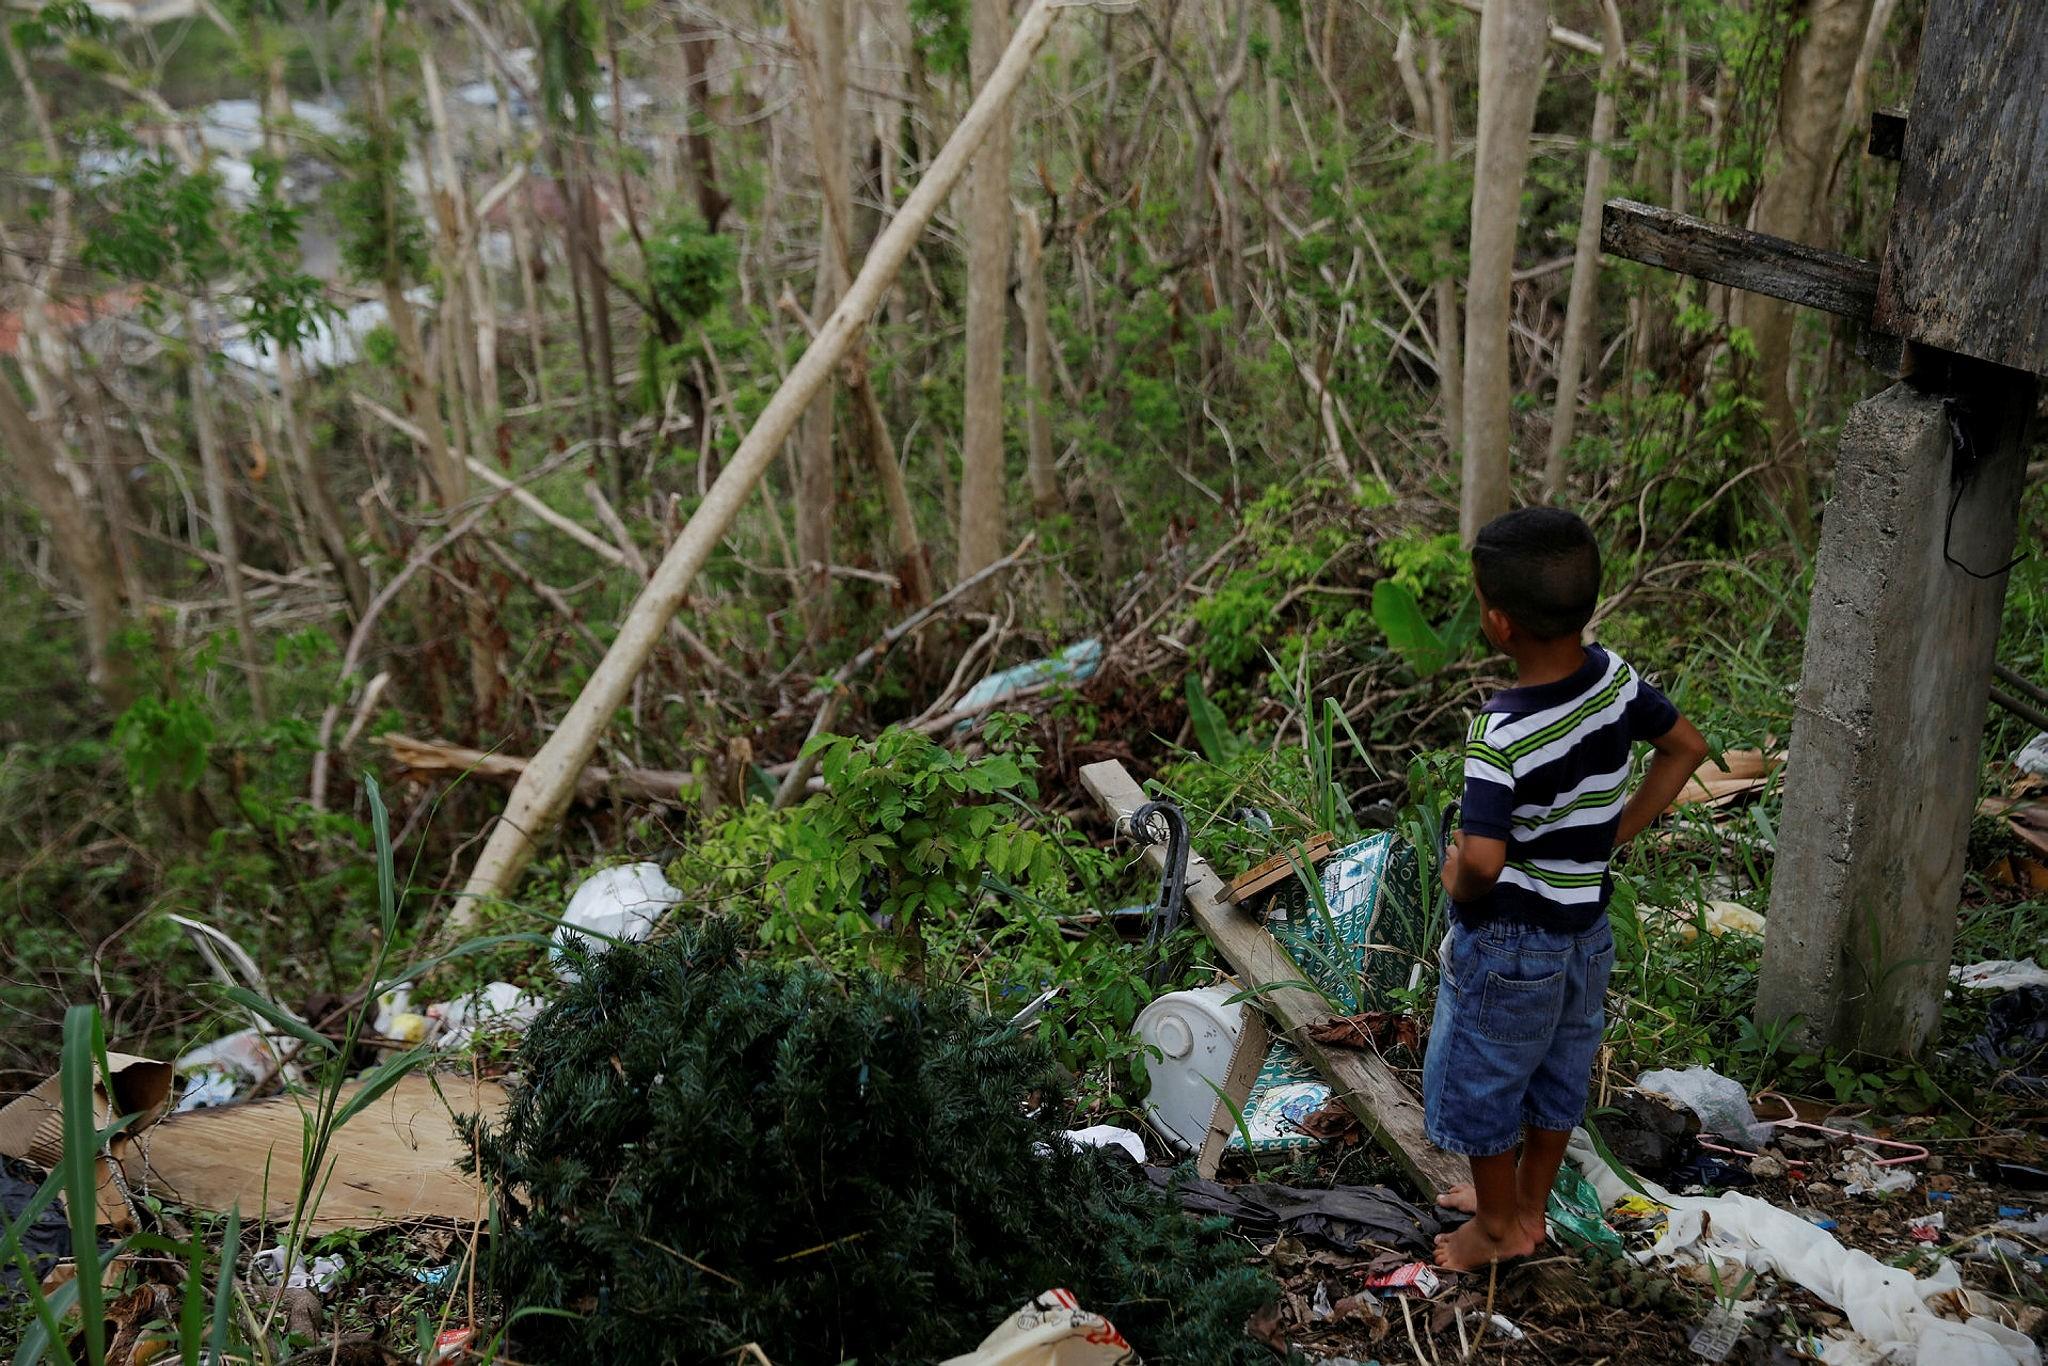 Yadriel Manuel, 6, looks outside a home damaged by Hurricane Maria in the Trujillo Alto municipality outside San Juan, Puerto Rico, October 9, 2017. (Reuters Photo)